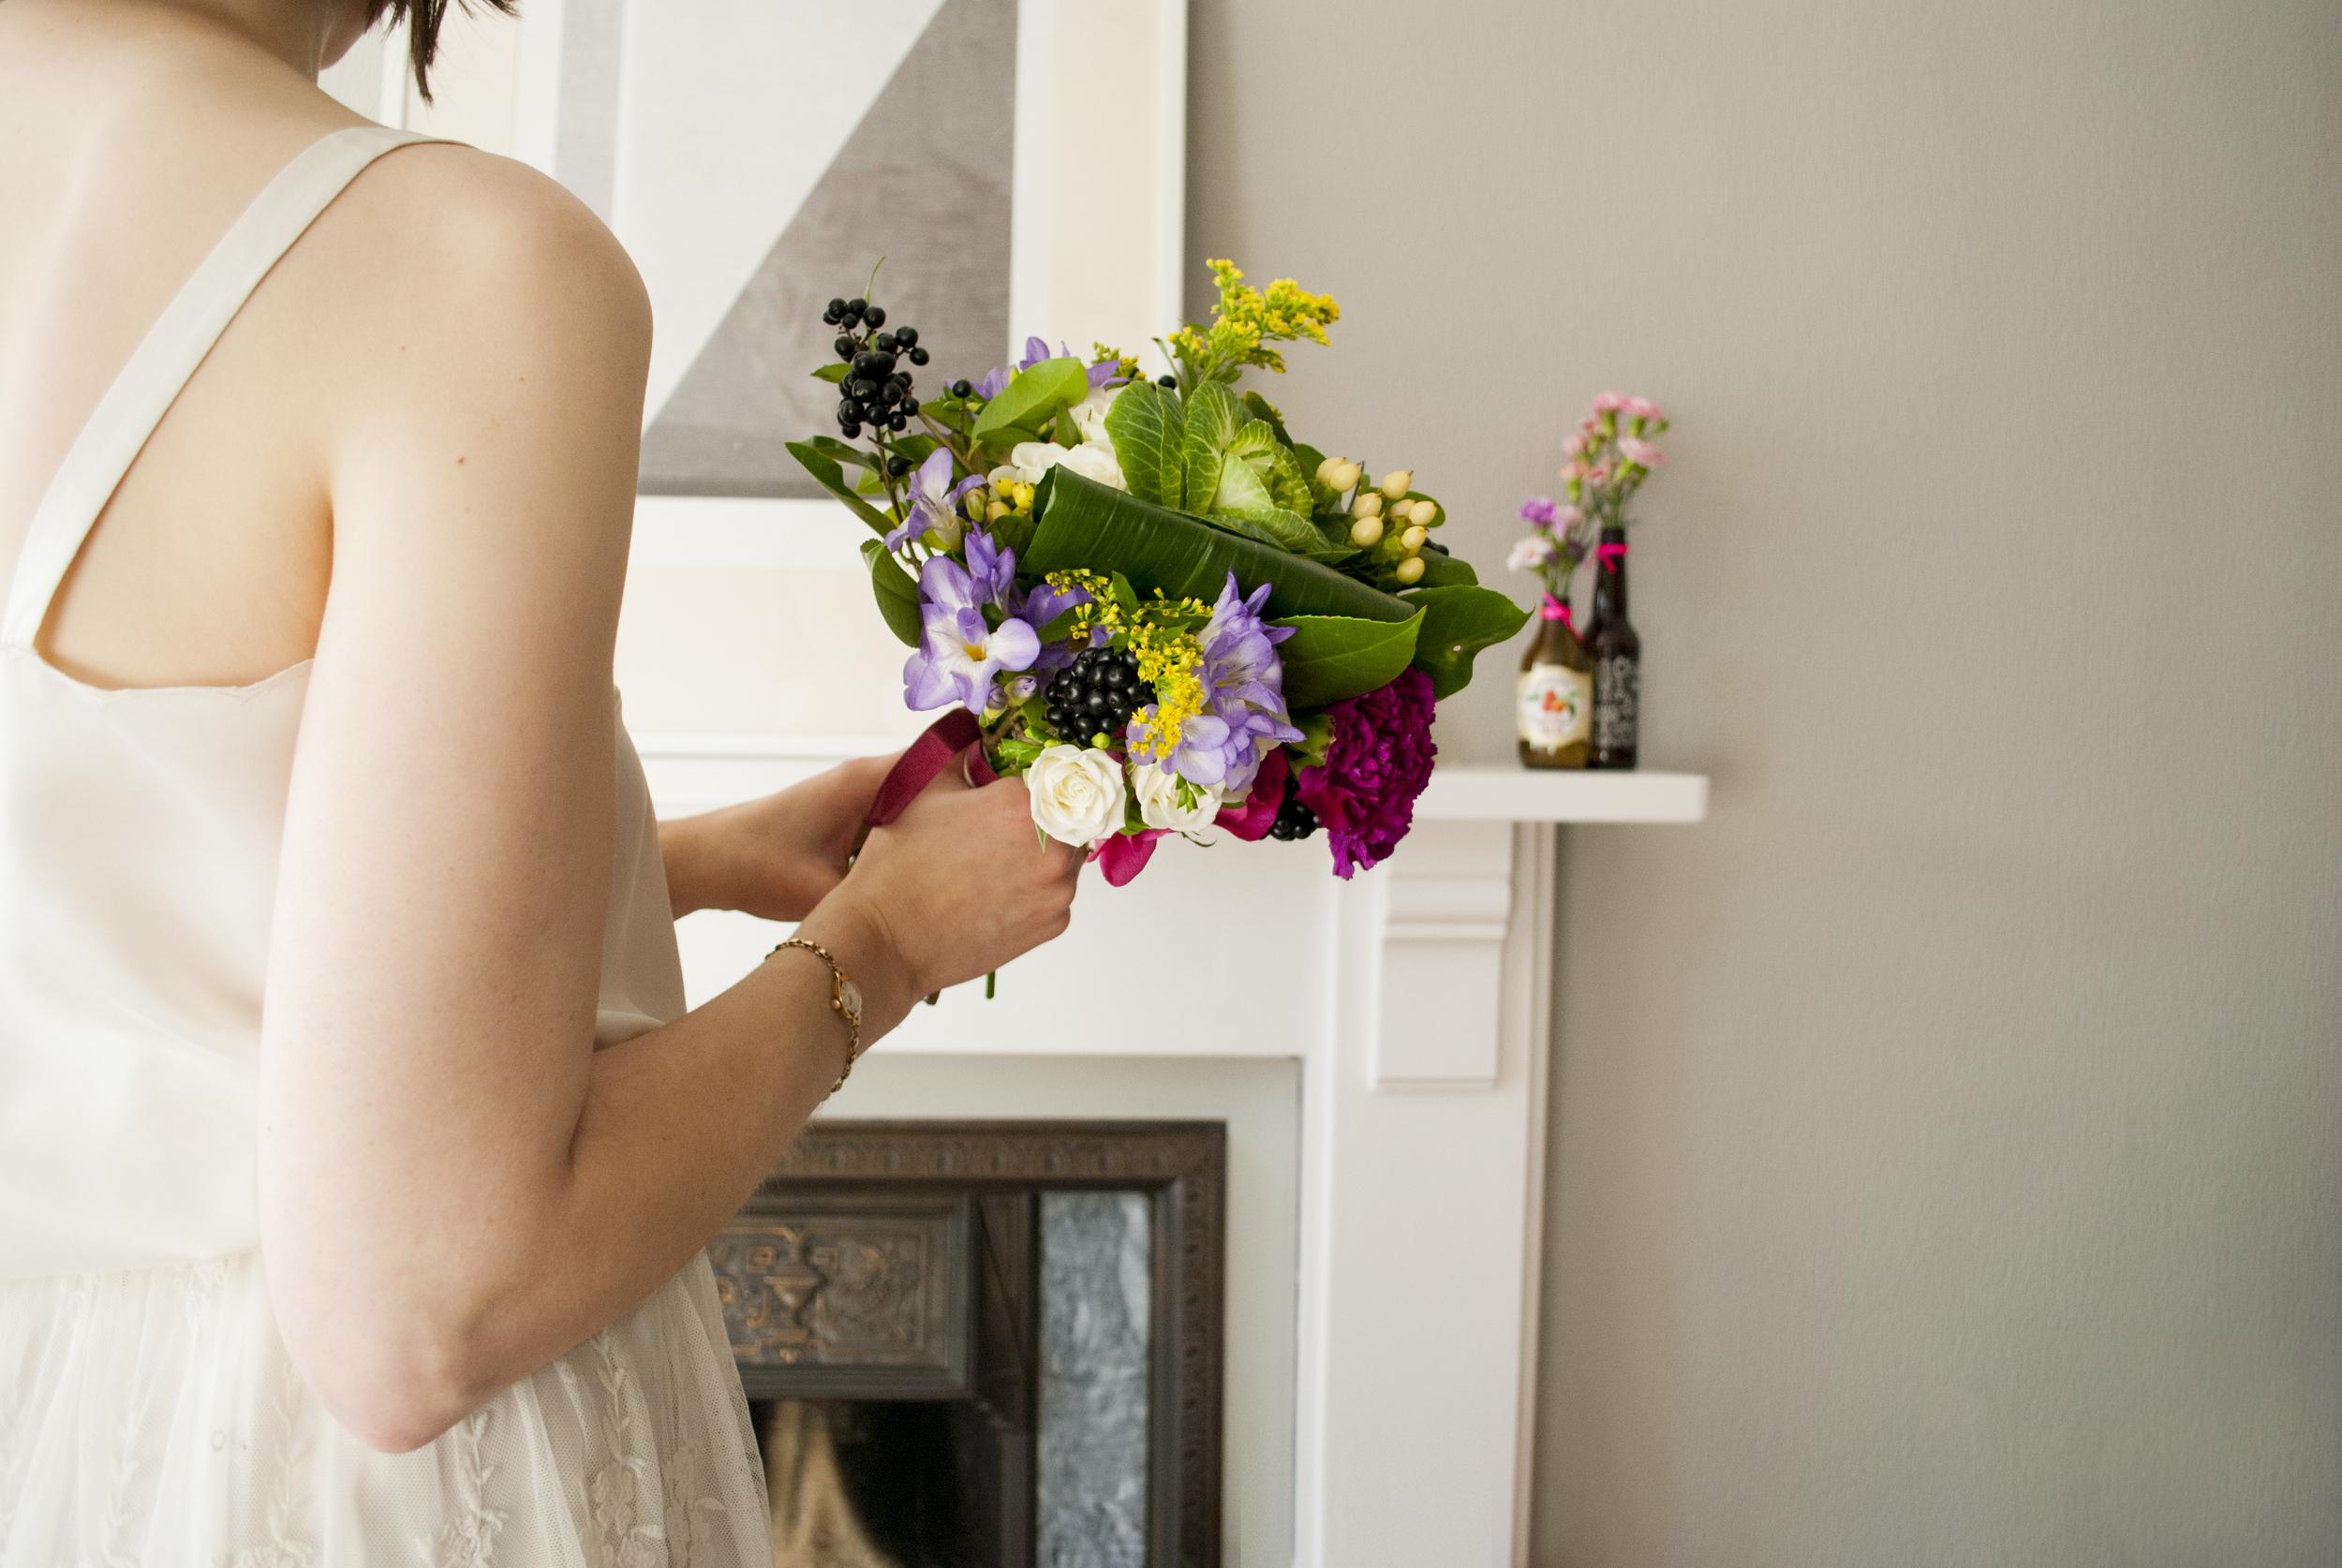 holding_bouquet.jpg